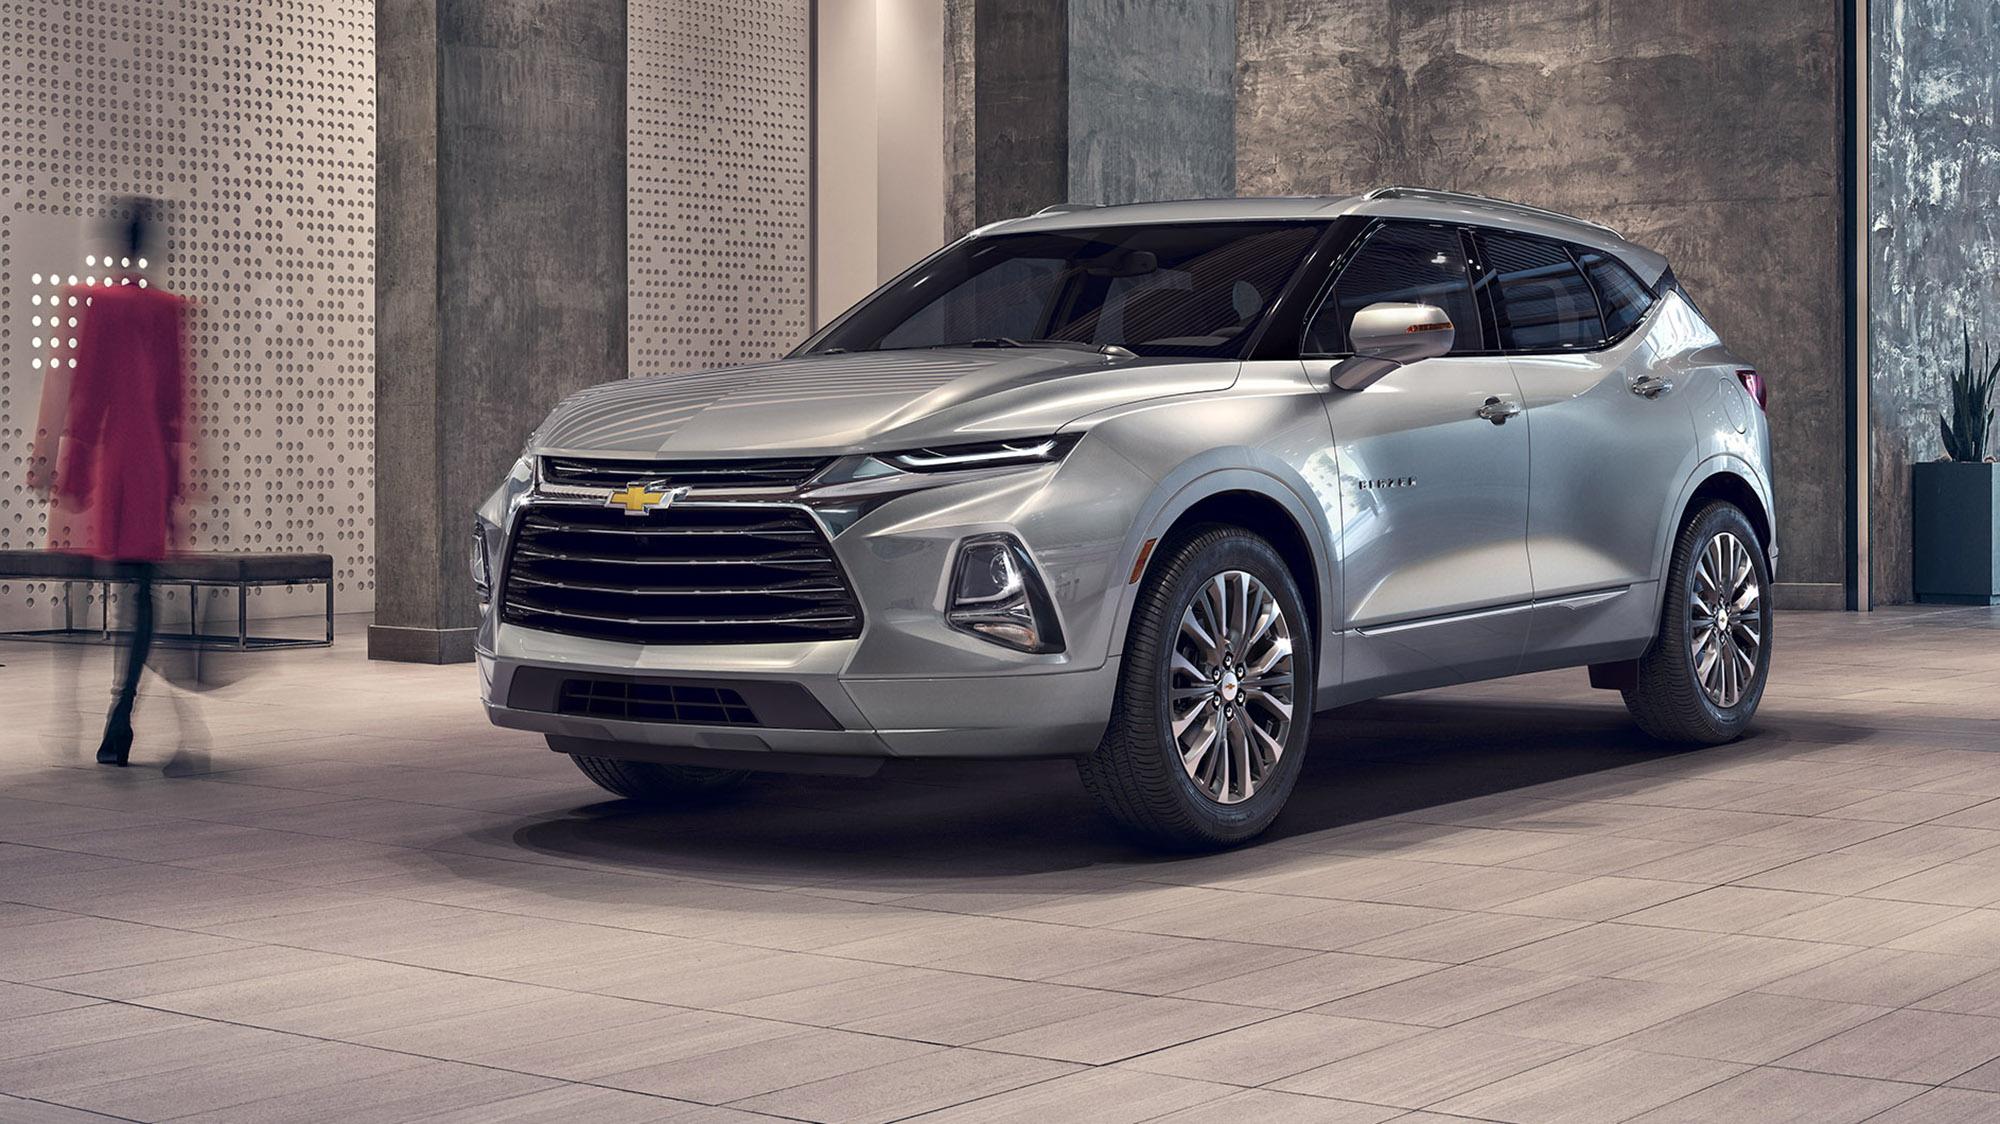 2019 Chevrolet Blazer Revealed Caradvice